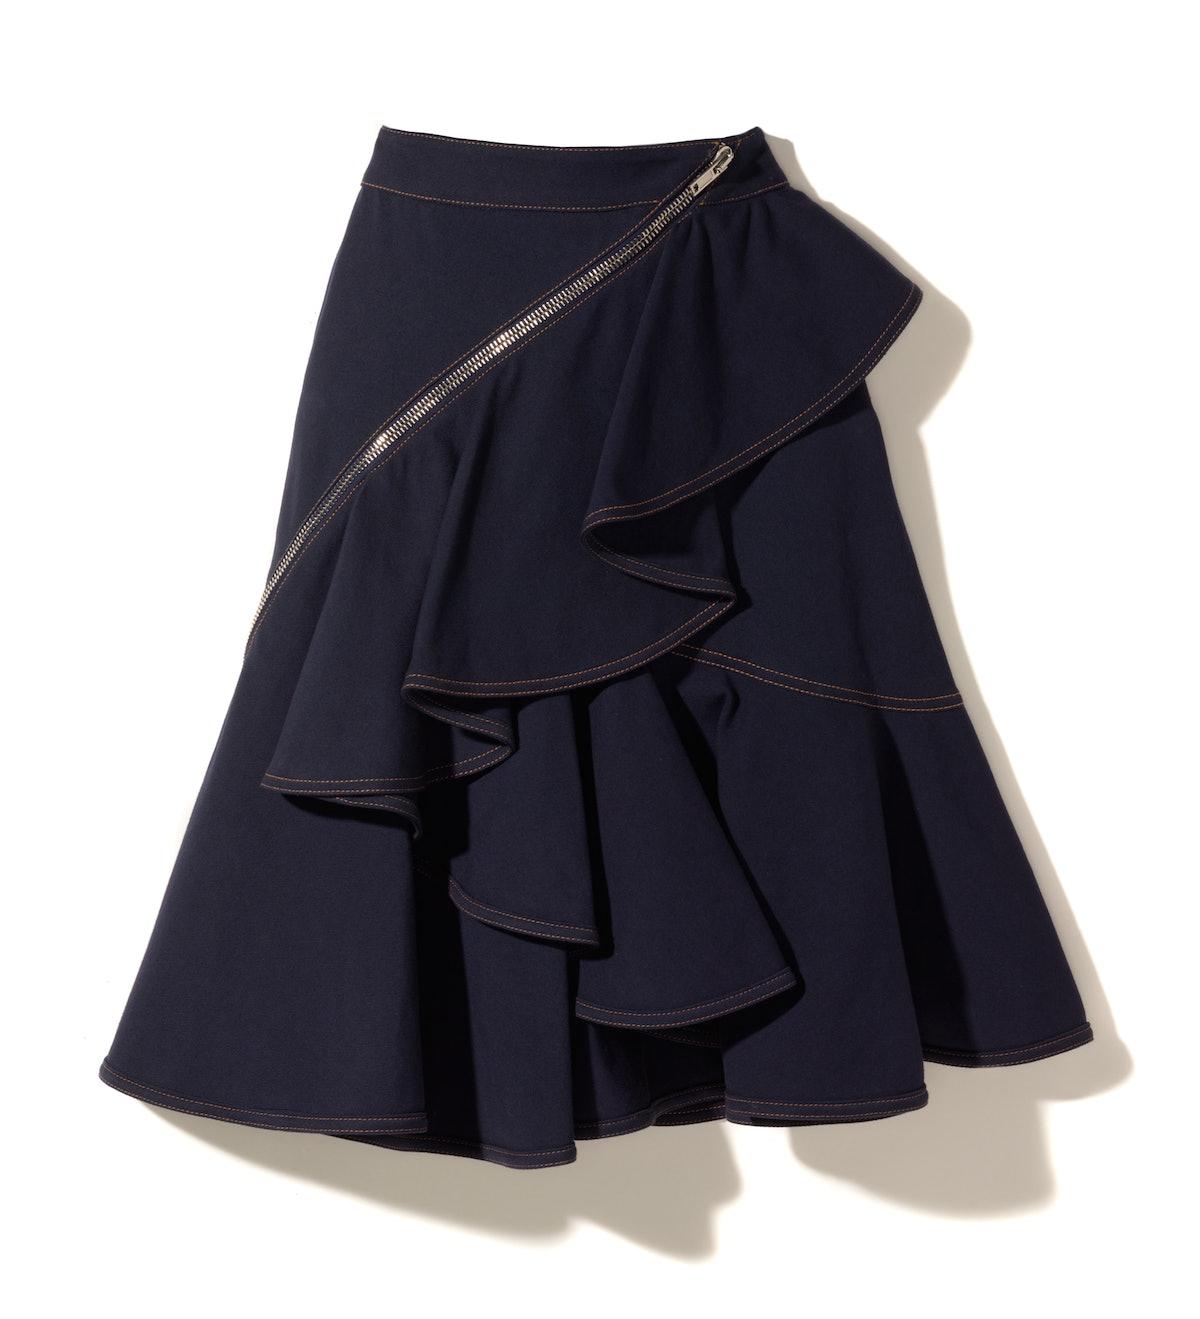 Givenchy by Riccardo Tisci skirt, $1,200, Neiman Marcus, 888.888.4757.